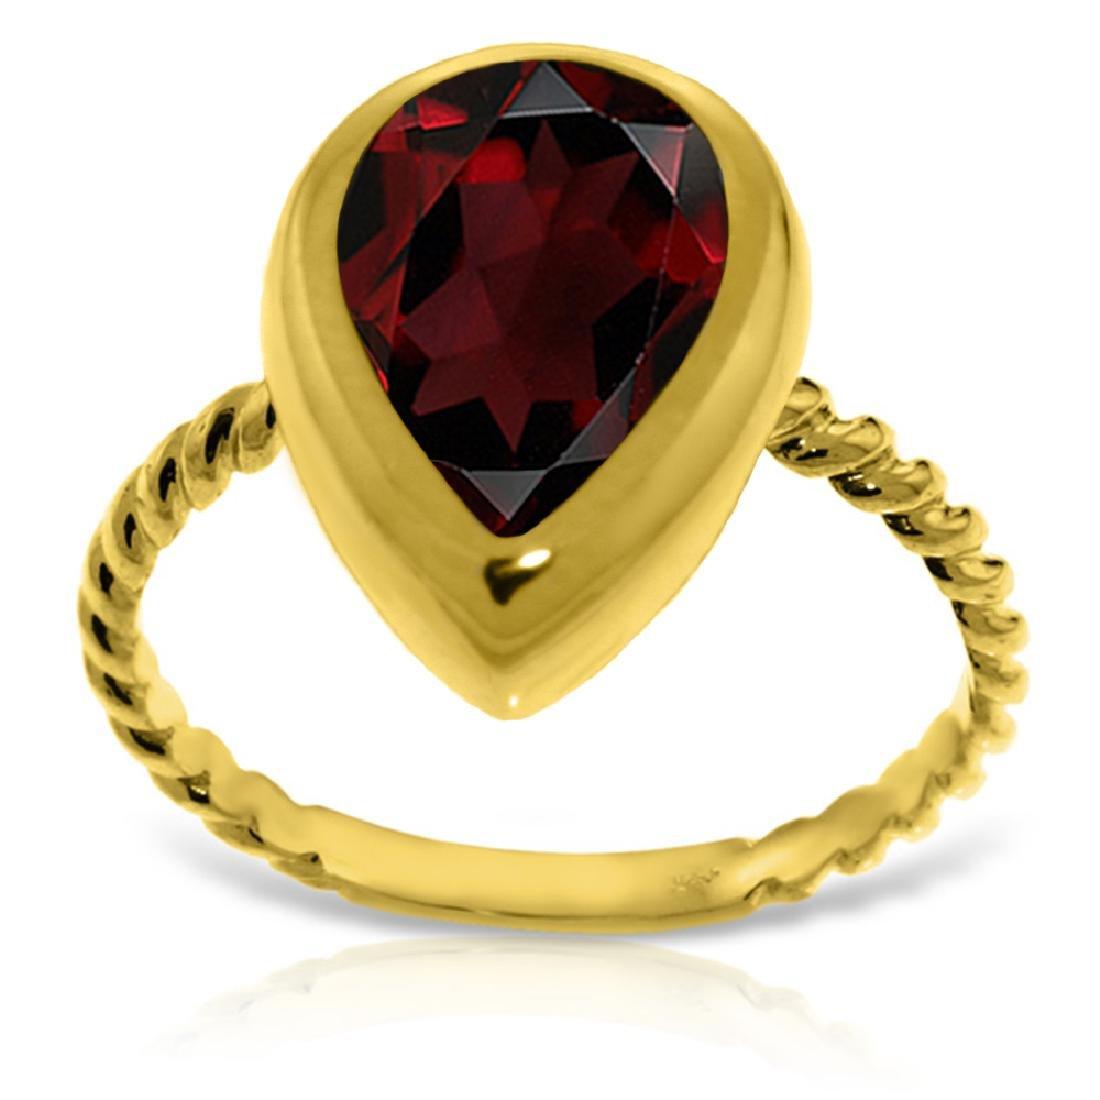 Genuine 3.5 ctw Garnet Ring Jewelry 14KT Yellow Gold -